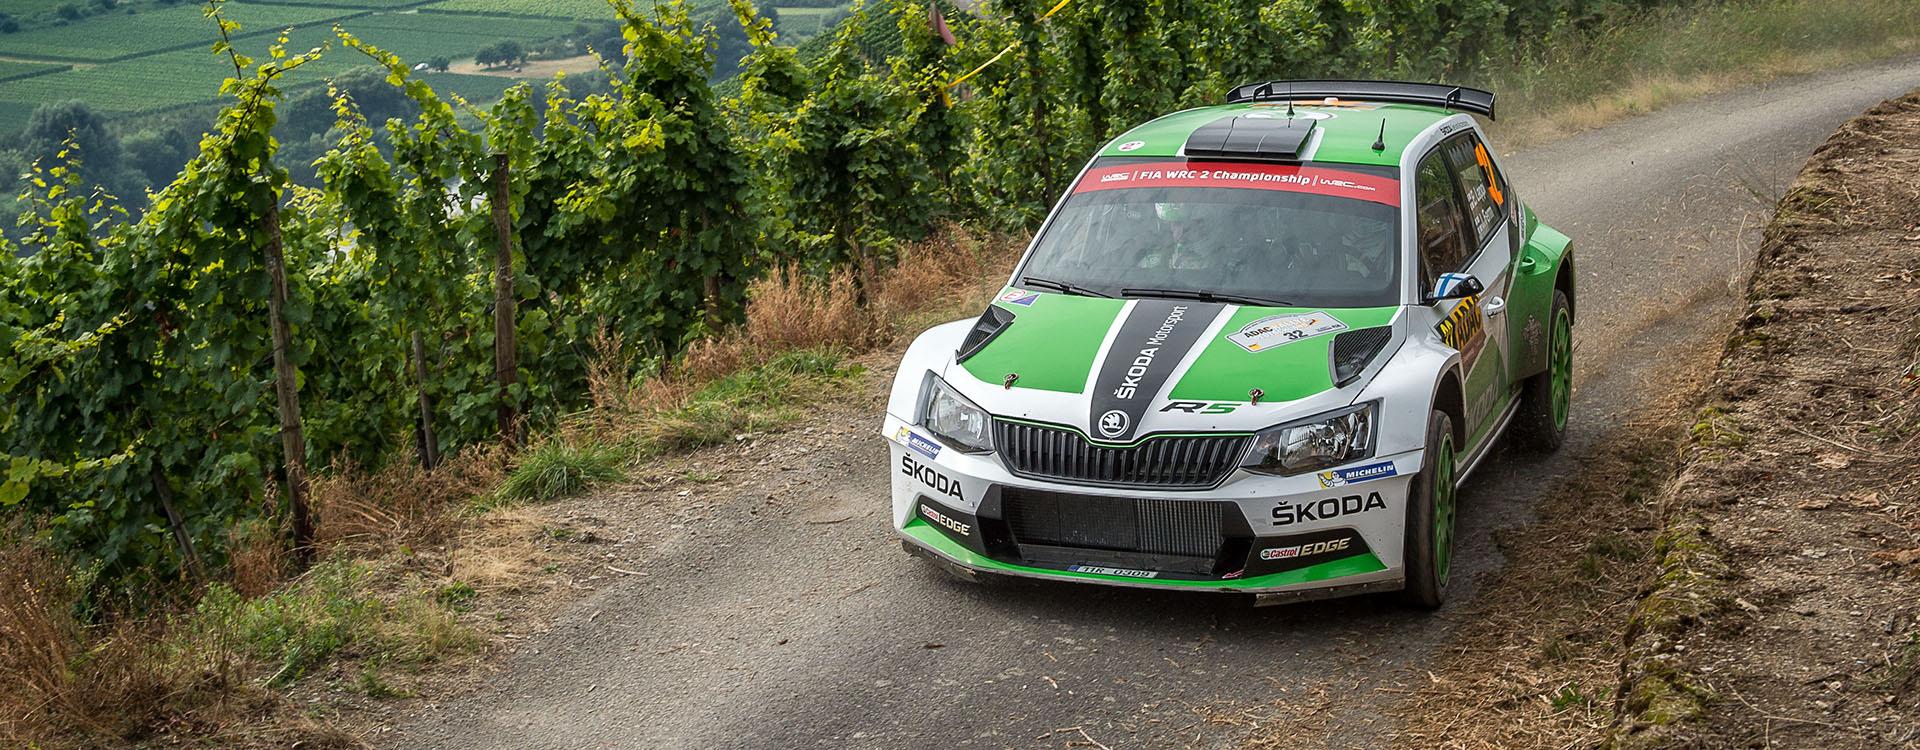 VIDEO: ŠKODA Motorsport na Rallye Deutschland 2016